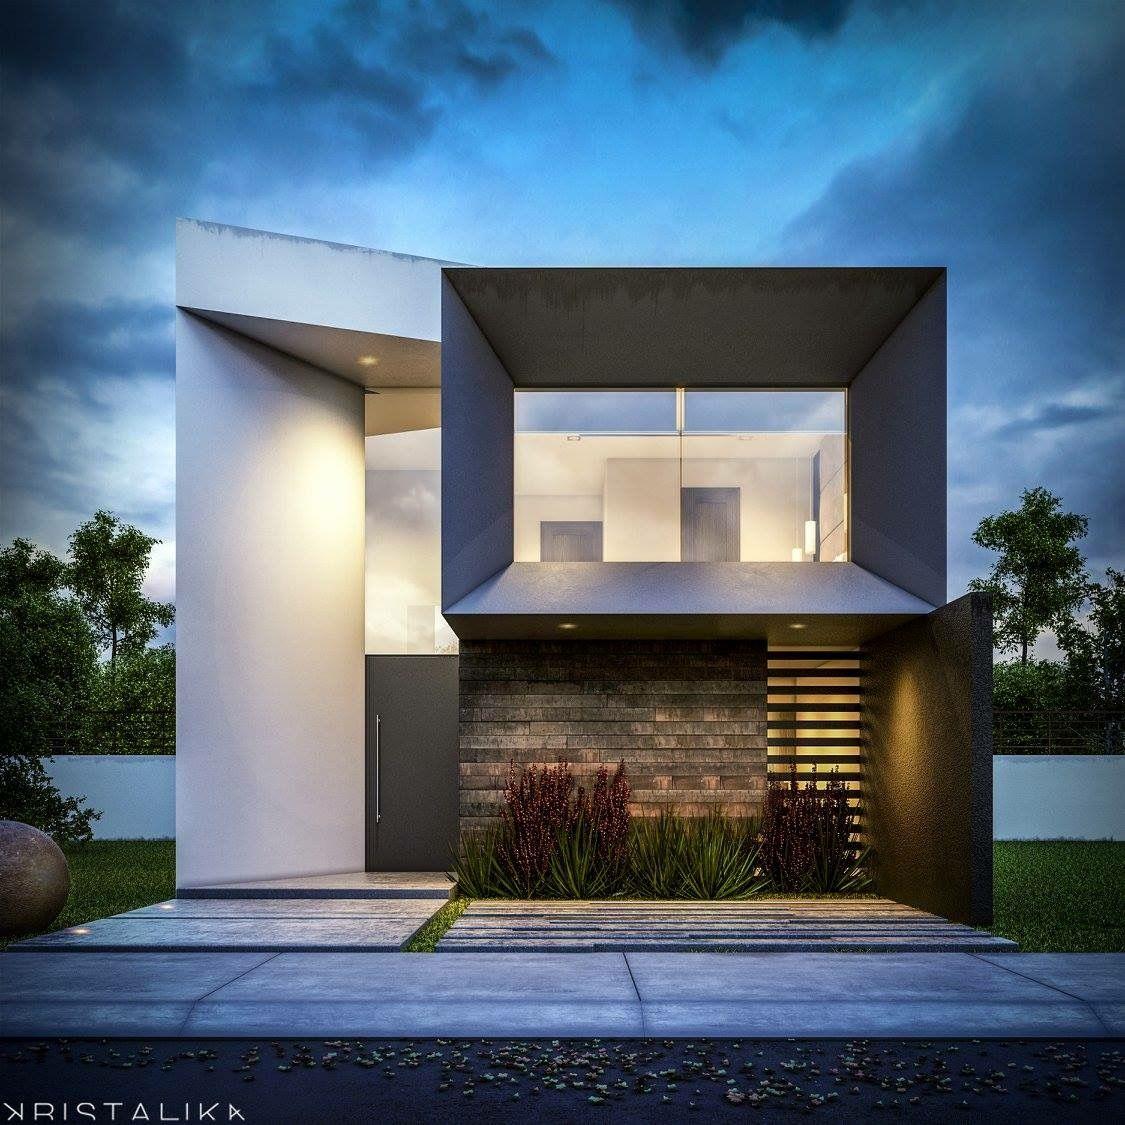 Pin de gilbert gomez en casa minimalista pinterest for Casa minimalista planos